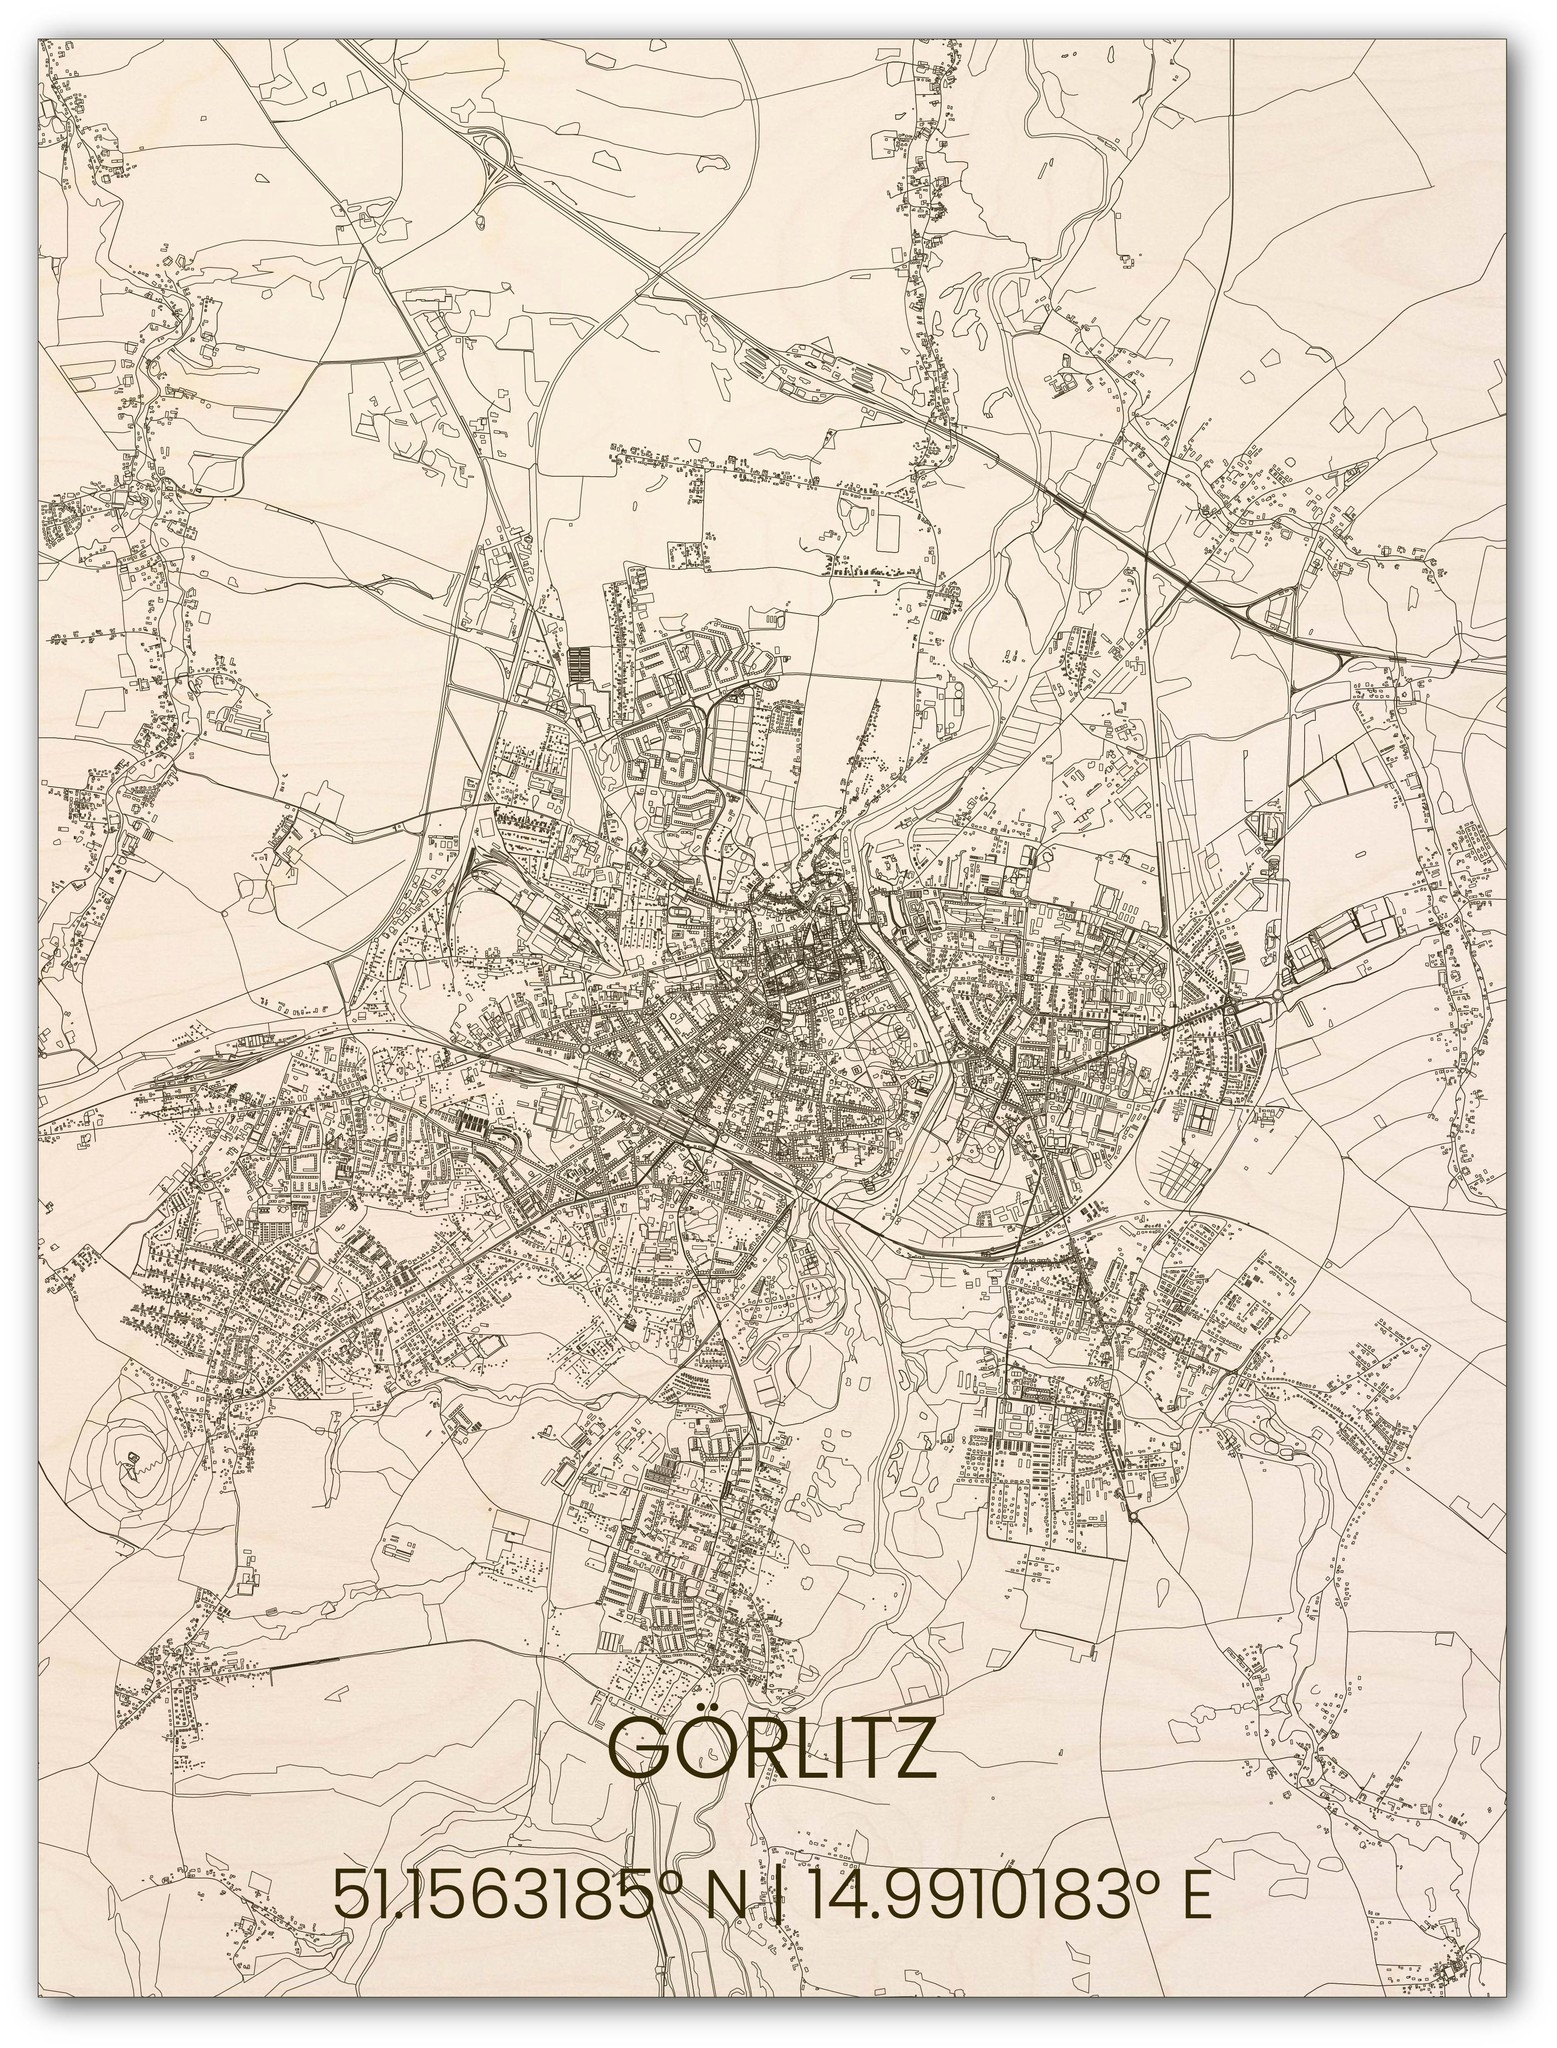 Houten stadsplattegrond Görlitz-1